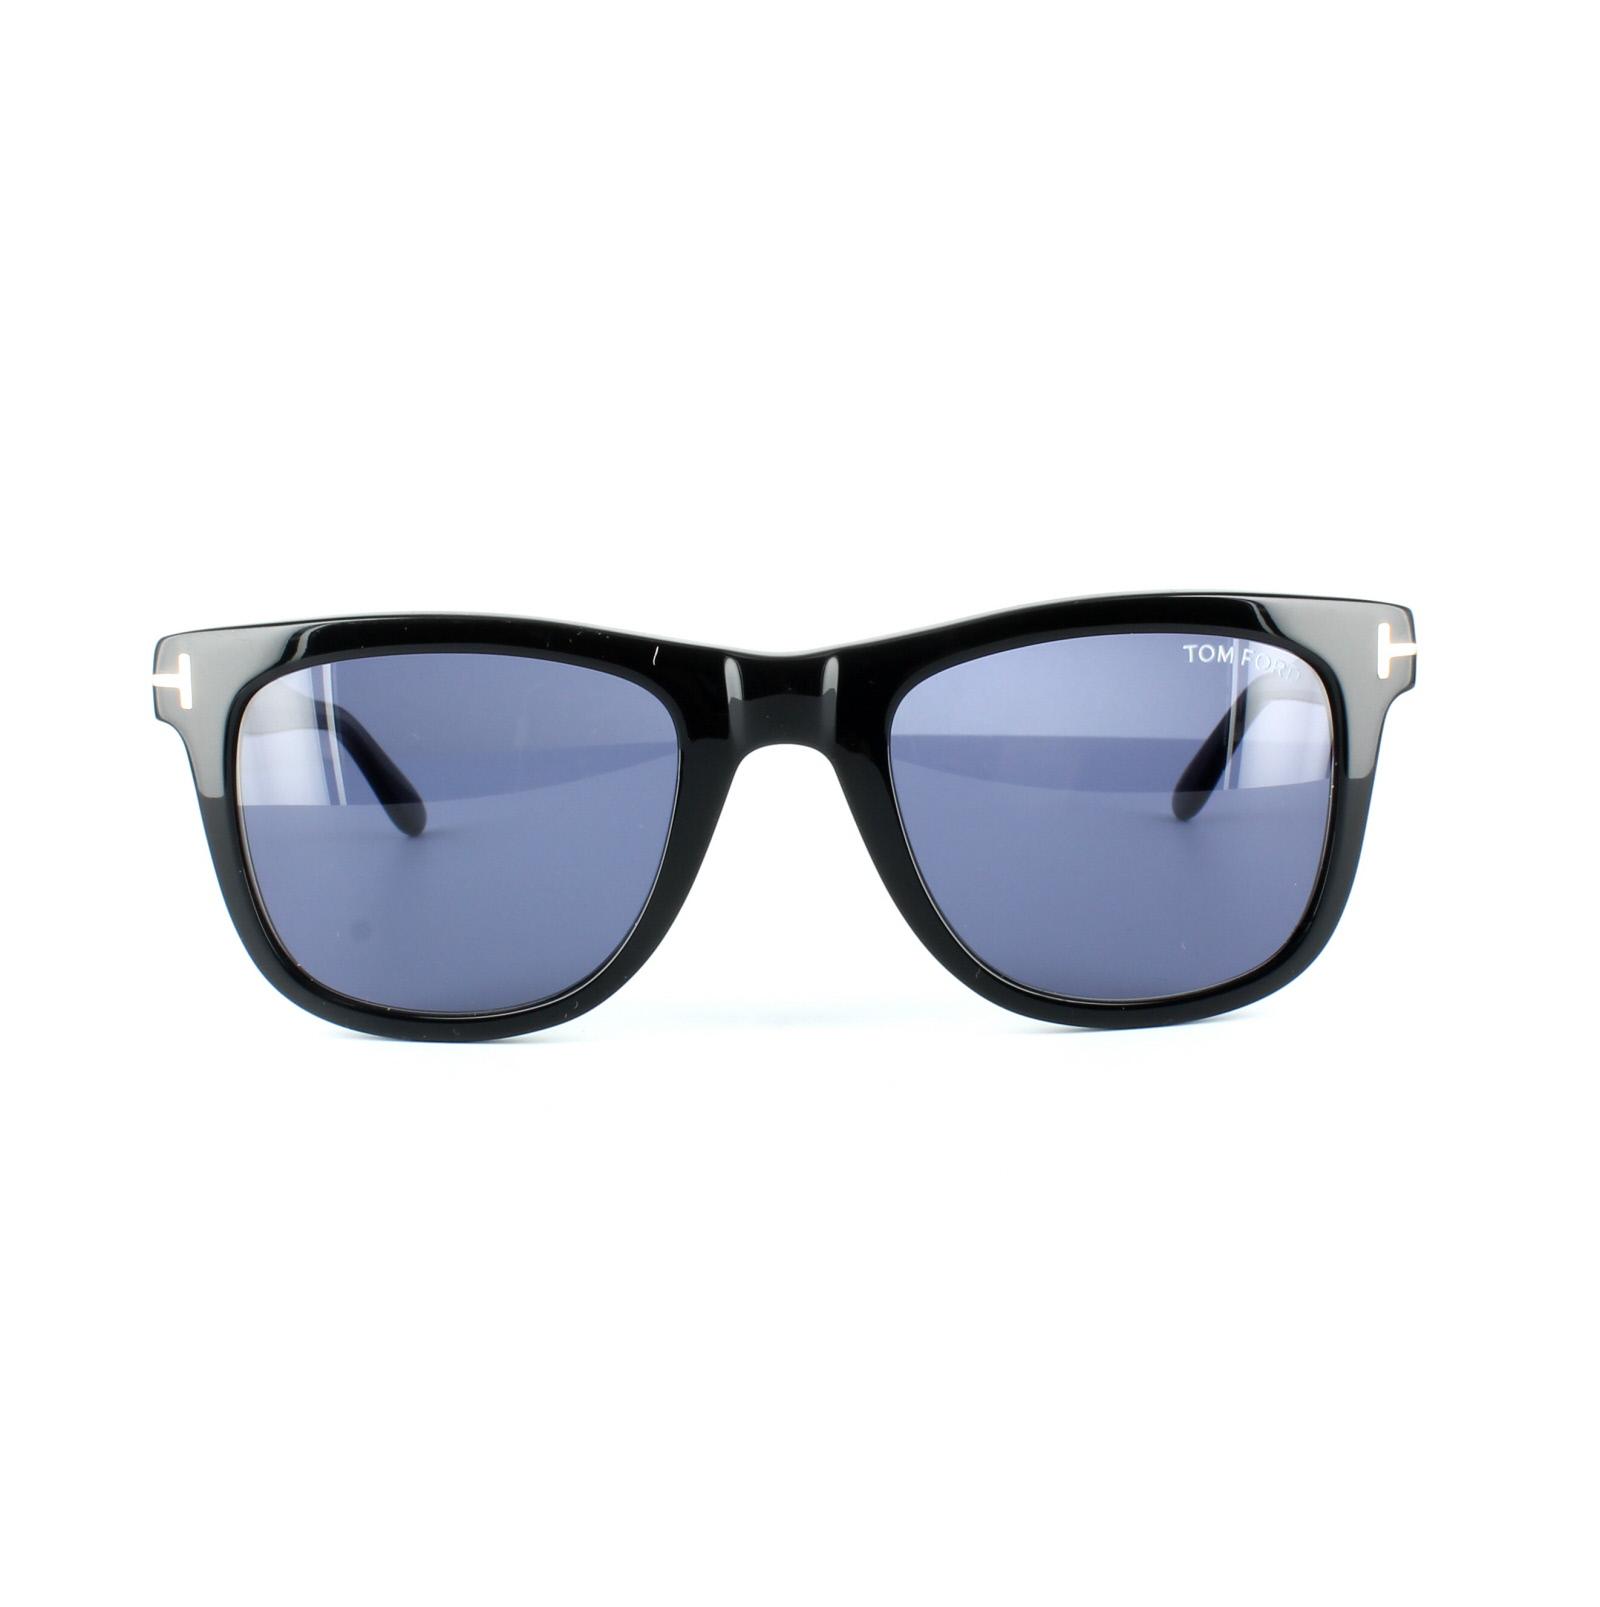 837185efcb9f9 Cheap Tom Ford 0336 Leo Sunglasses - Discounted Sunglasses